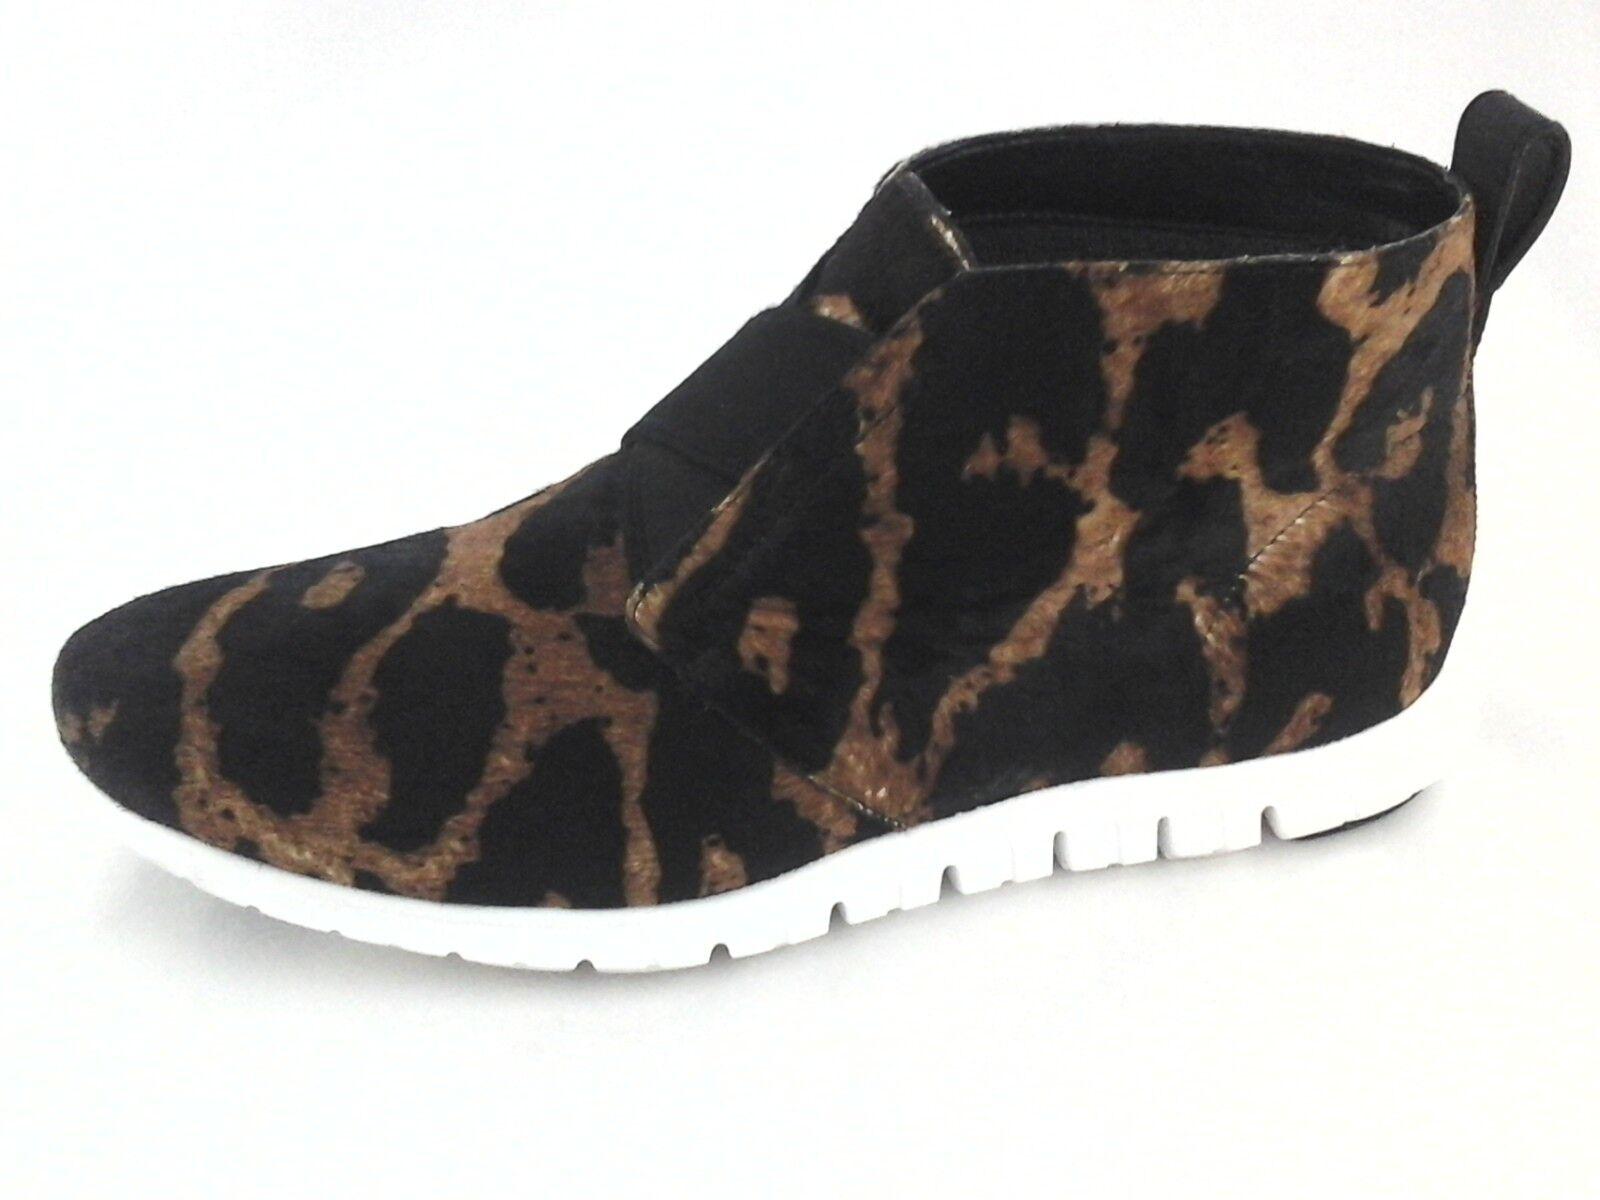 af9562e7a62 COLE HAAN Chukka Bootie Leopard Calf Hair Shoes Sneakers Women's US 8 EU 39  $228